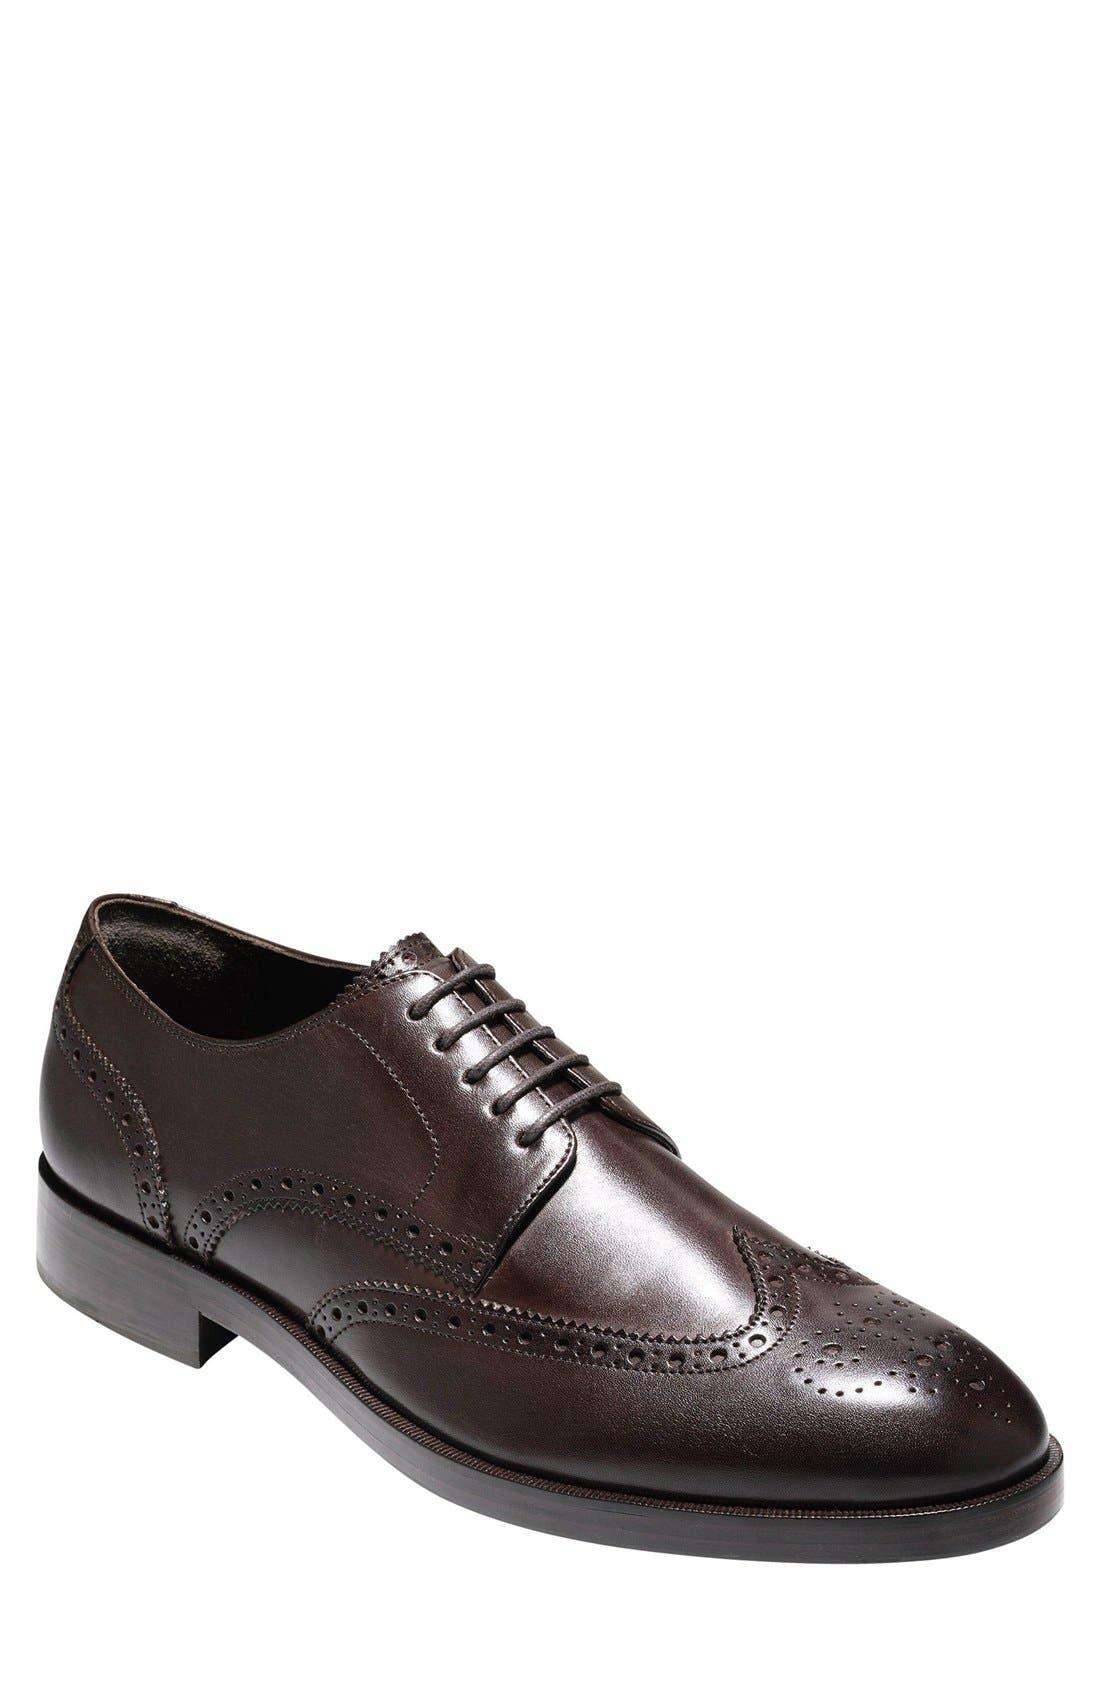 'Harrison Grand' Wingtip,                             Alternate thumbnail 2, color,                             Dark Brown Leather